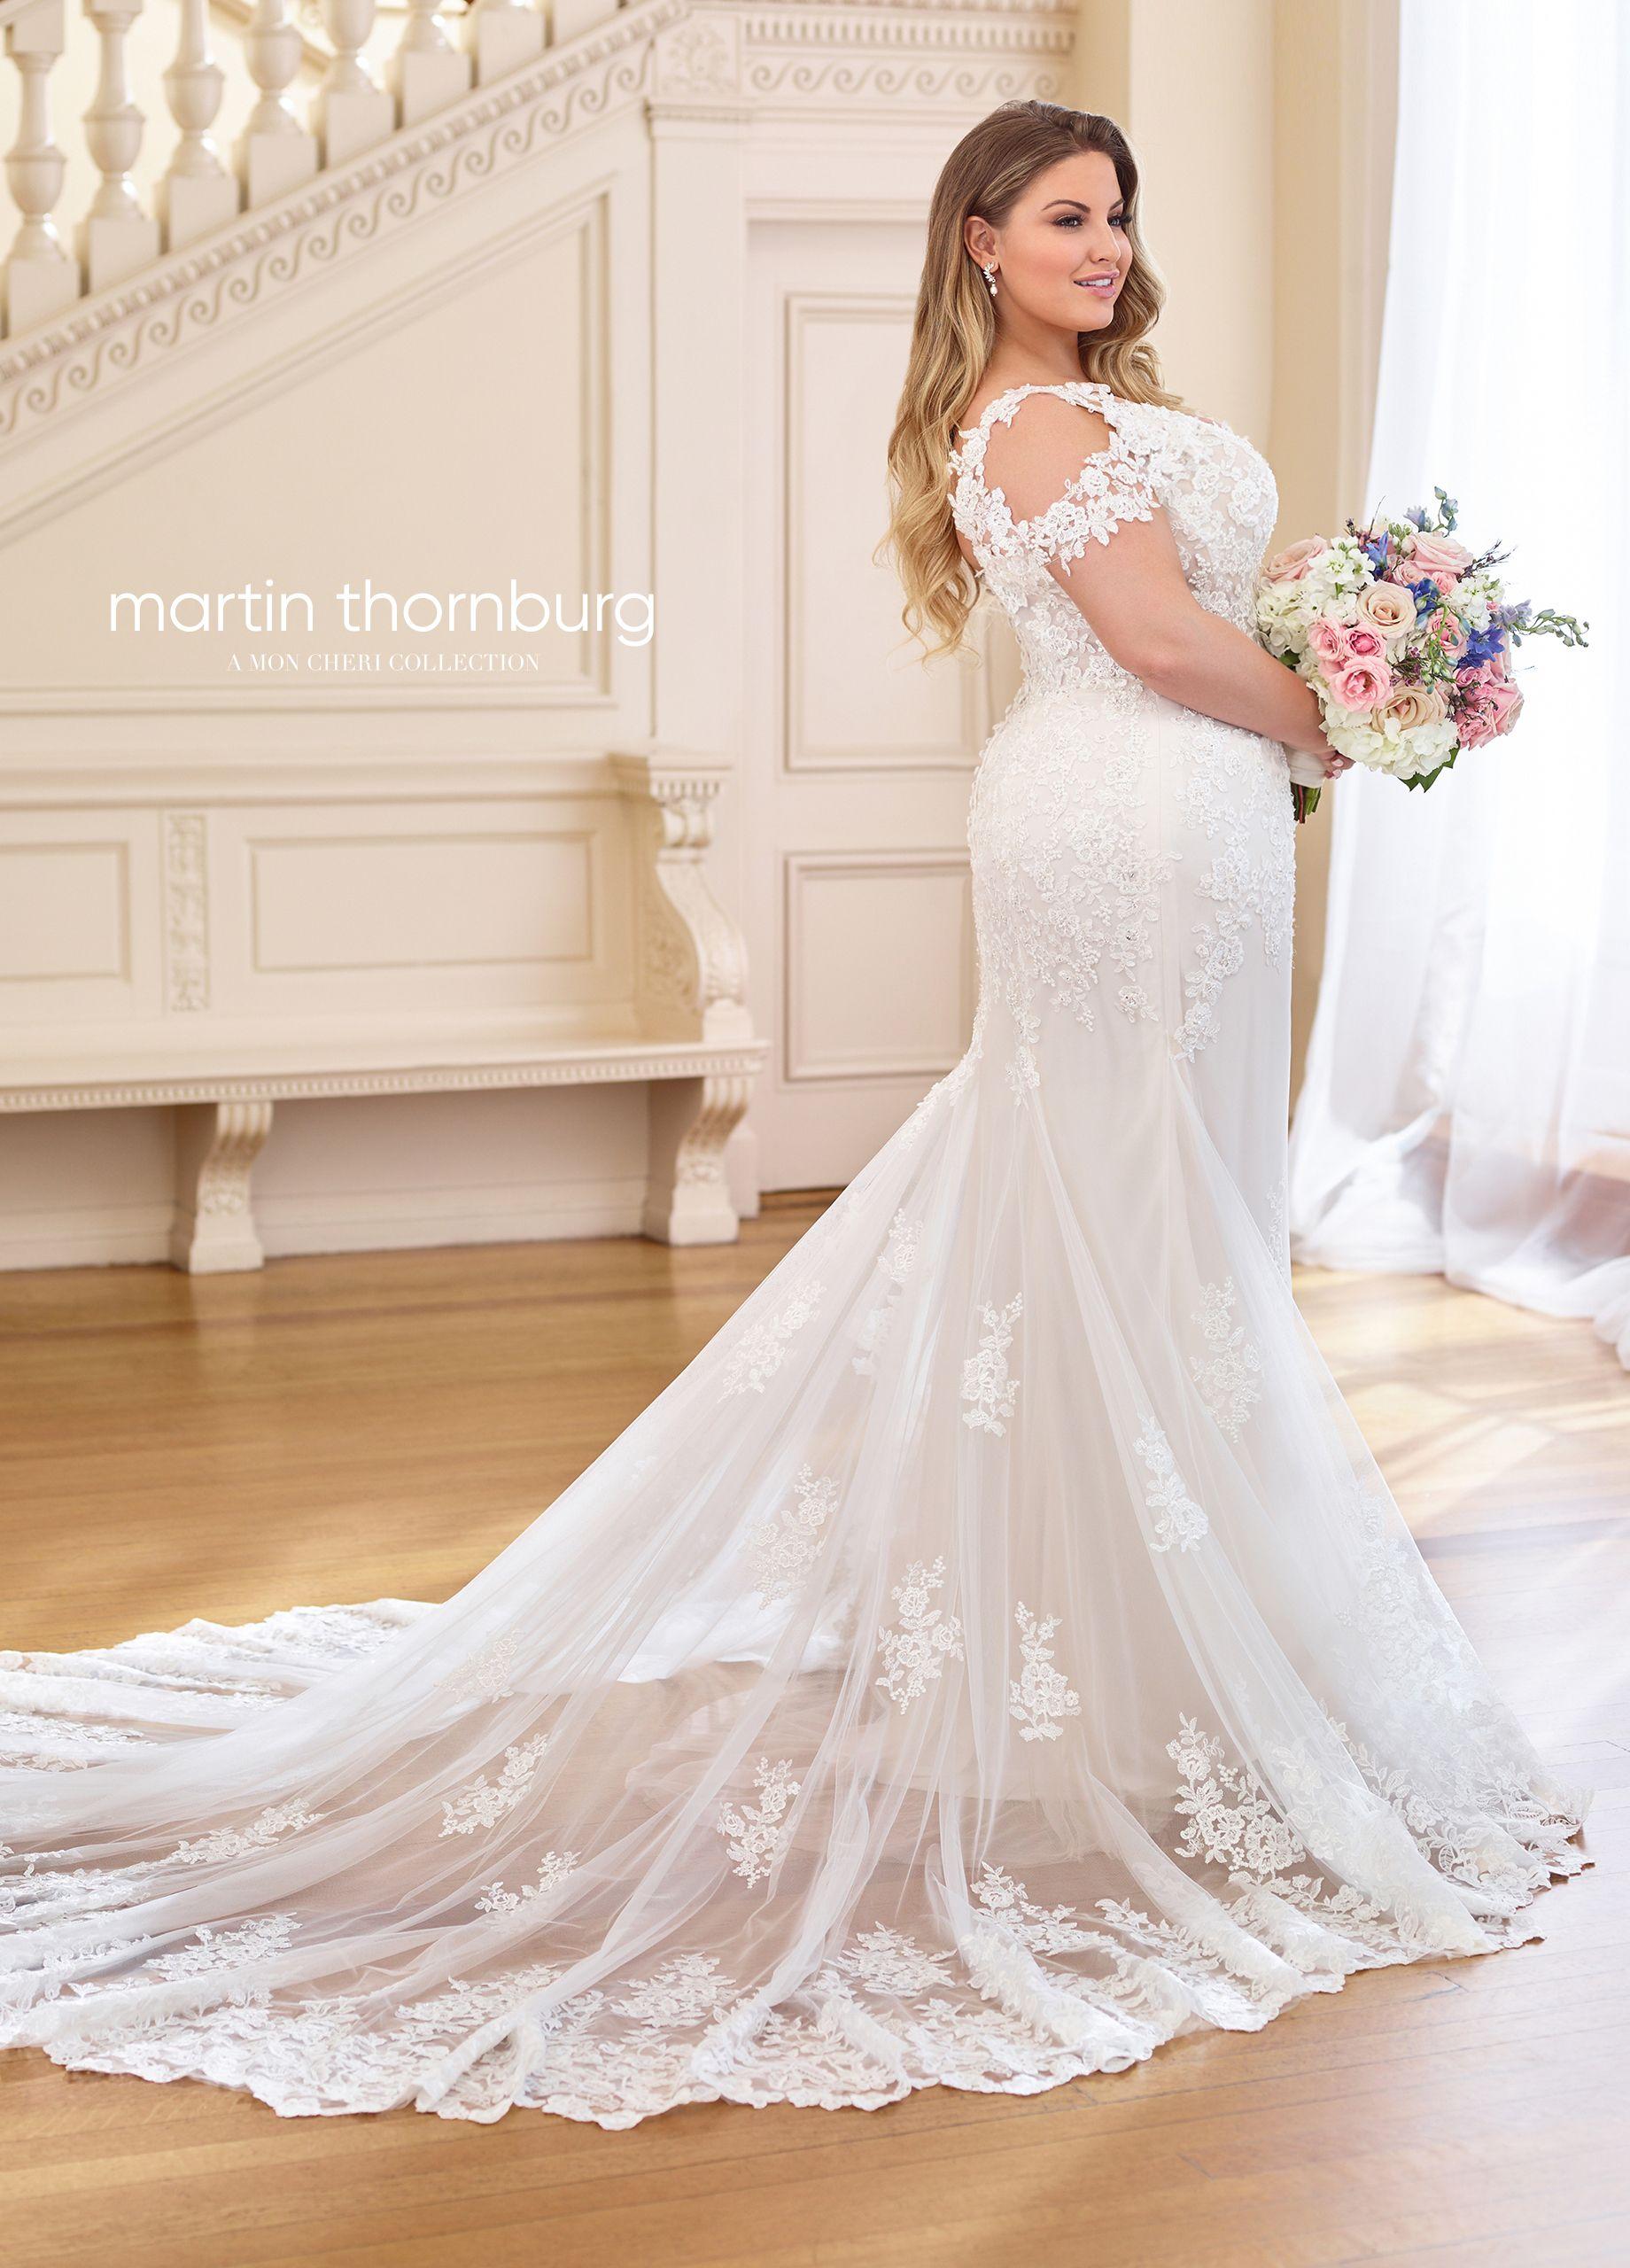 Cream colored vintage wedding dresses  W June  Wedding dresses  Pinterest  Wedding dresses